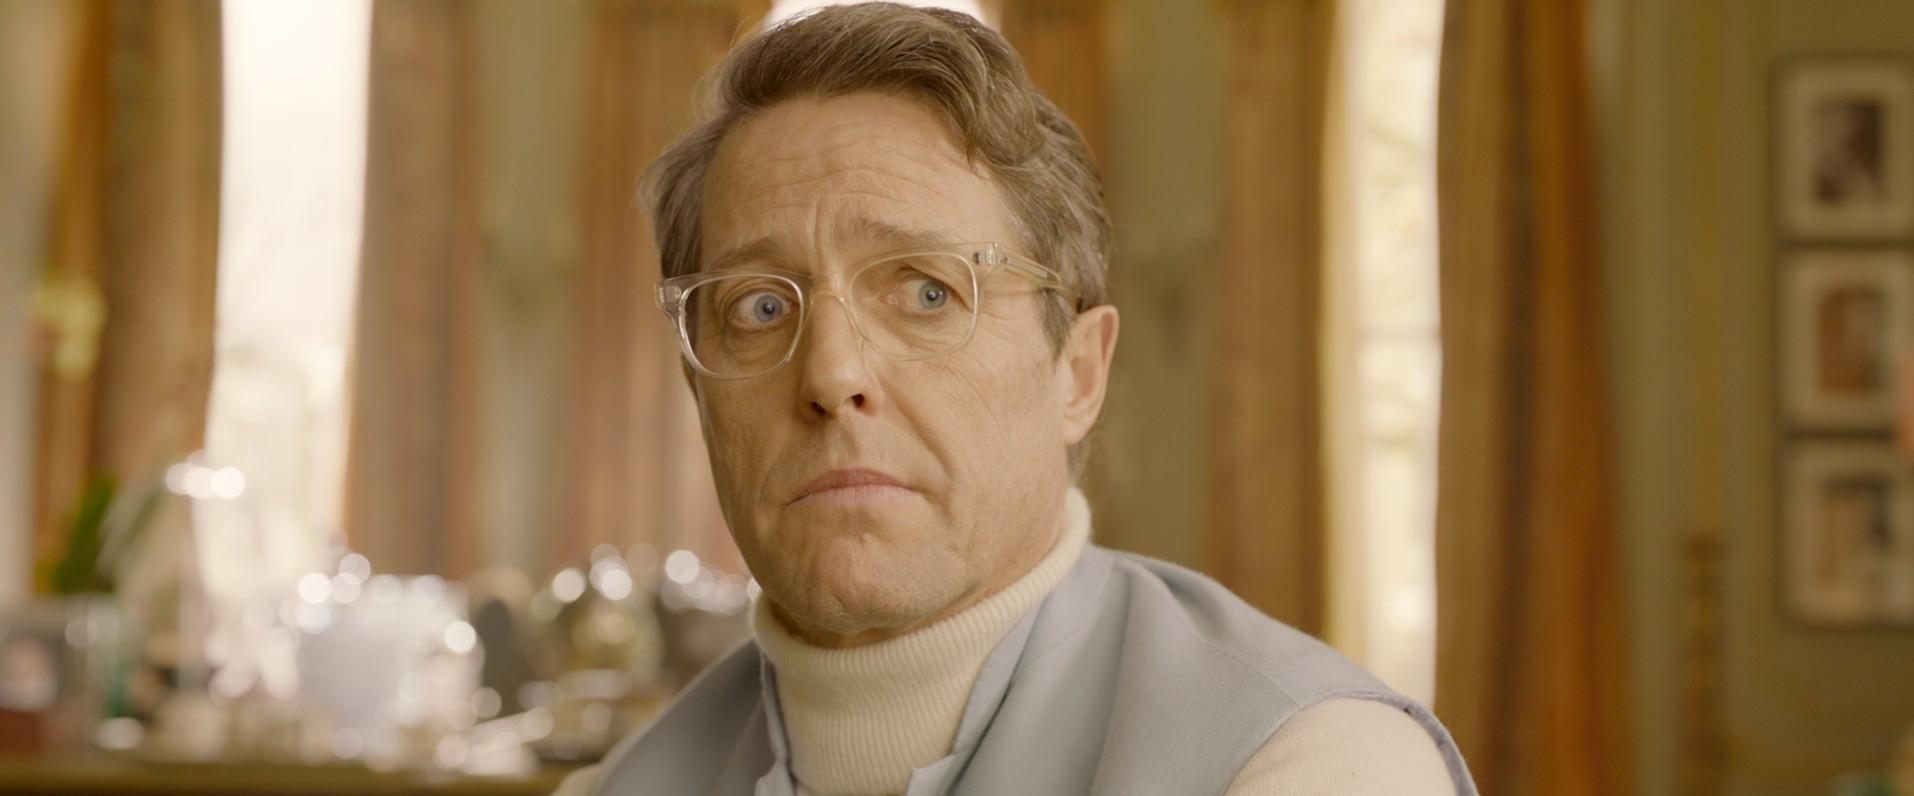 Hugh Grant plays a bad guy wonderfully well in Paddington 2